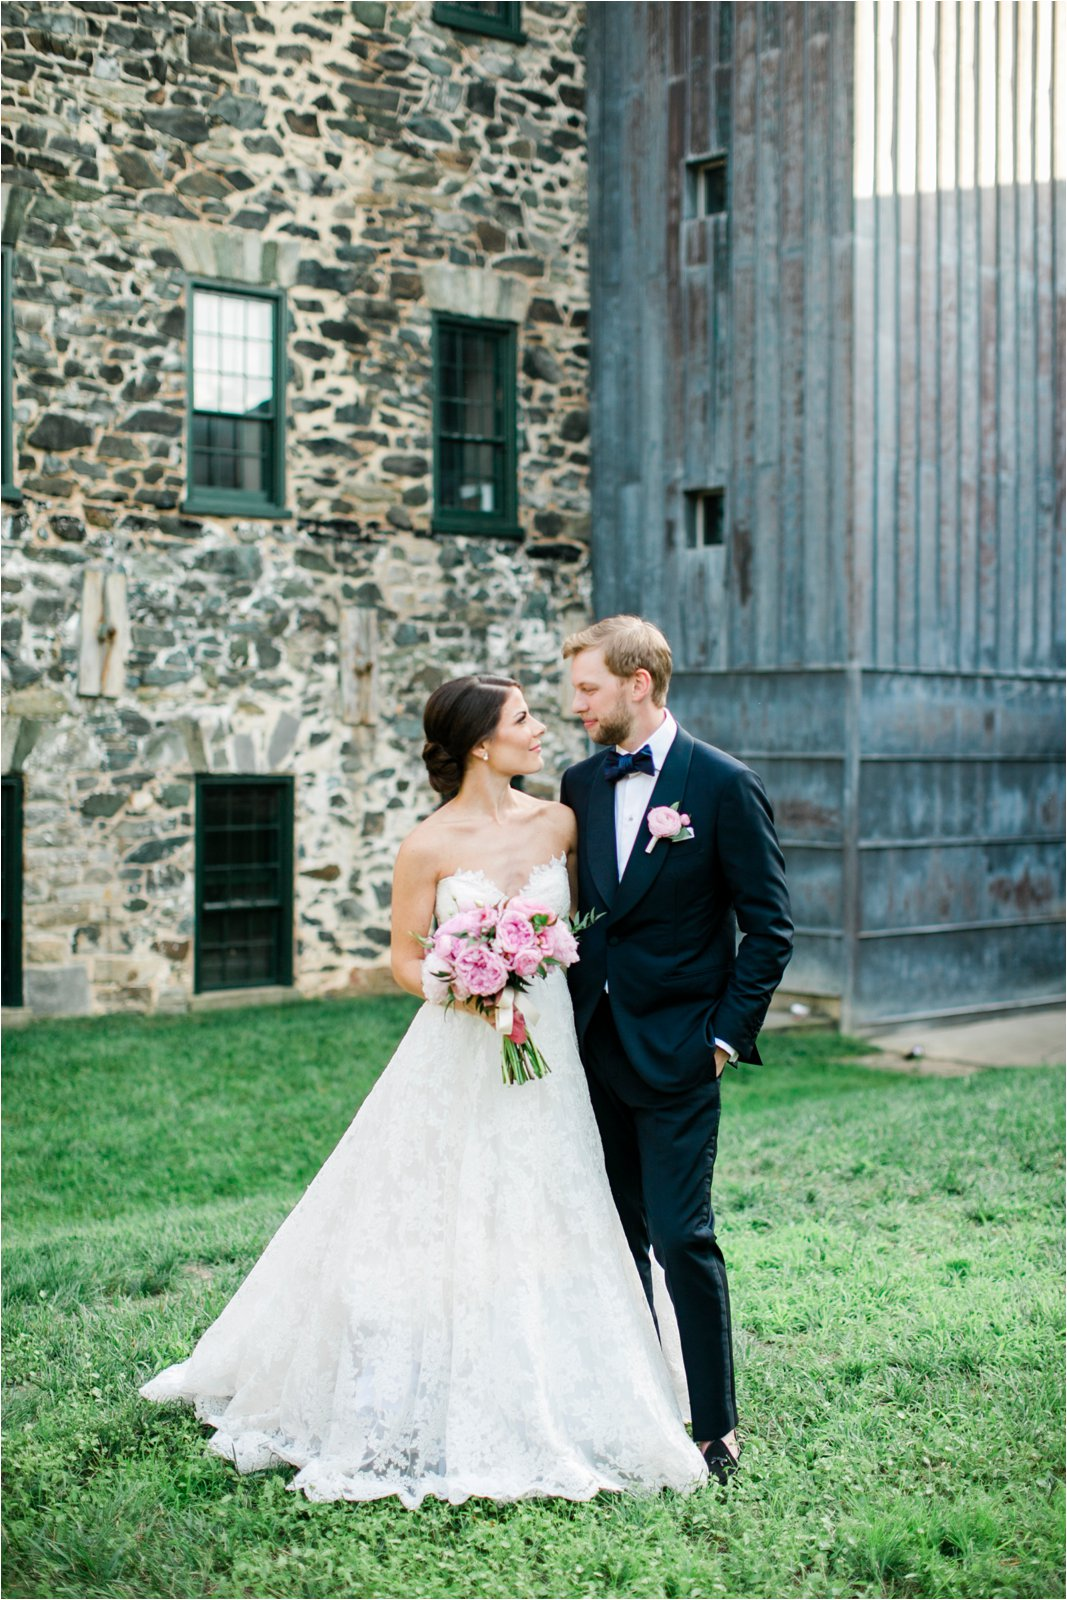 Baltimore Wedding Photographer_097.jpg